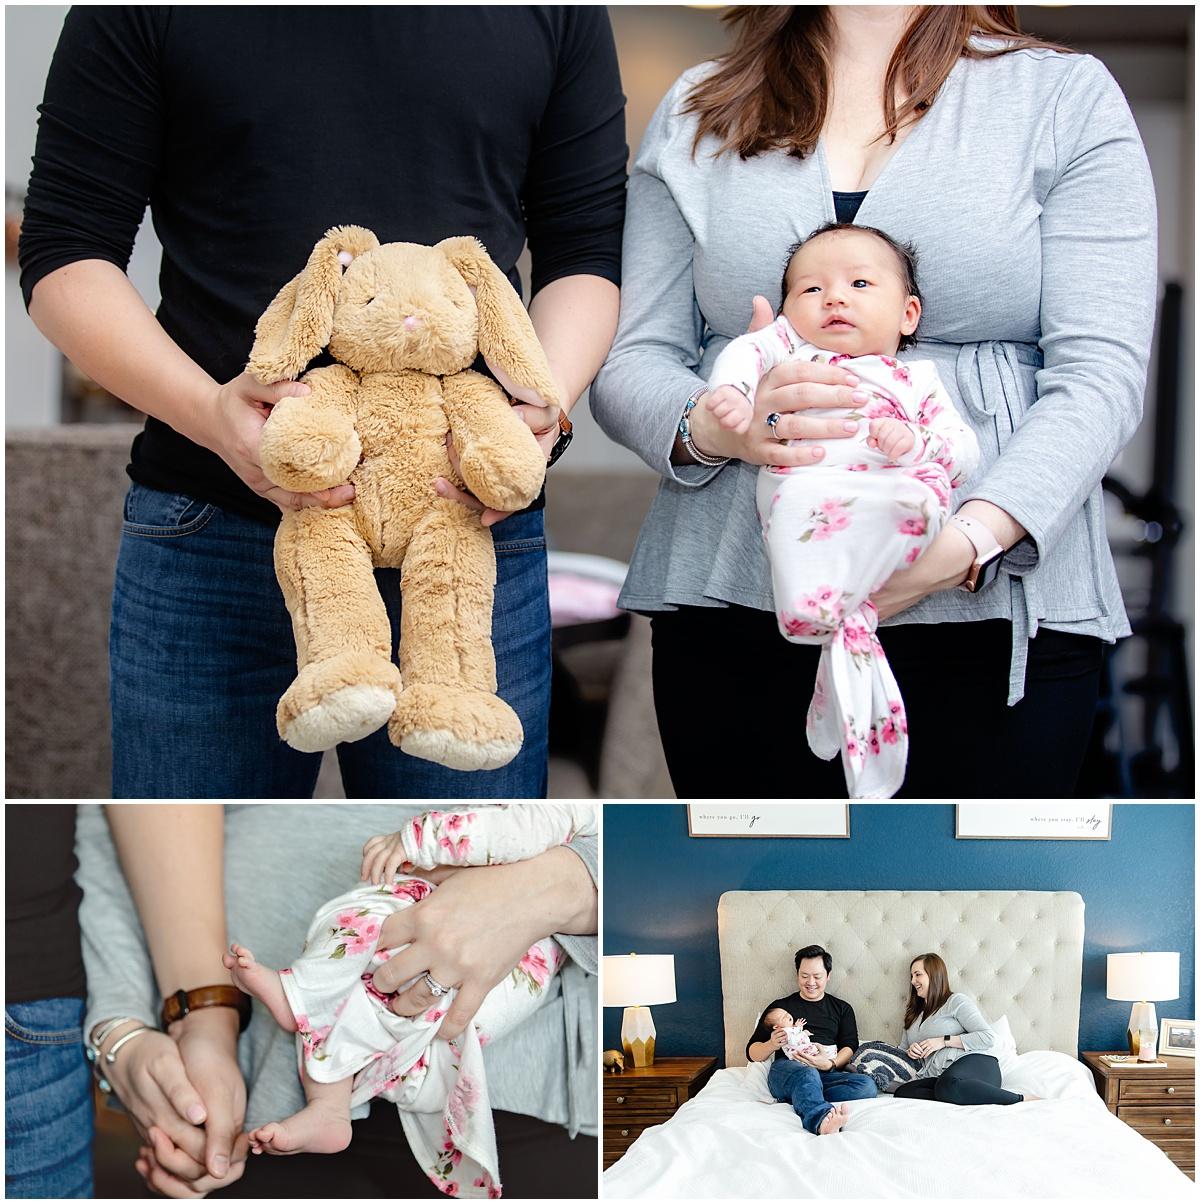 Lifestyle-newborn-family-photos-san-antonio-texas-carly-barton-photography_0004.jpg